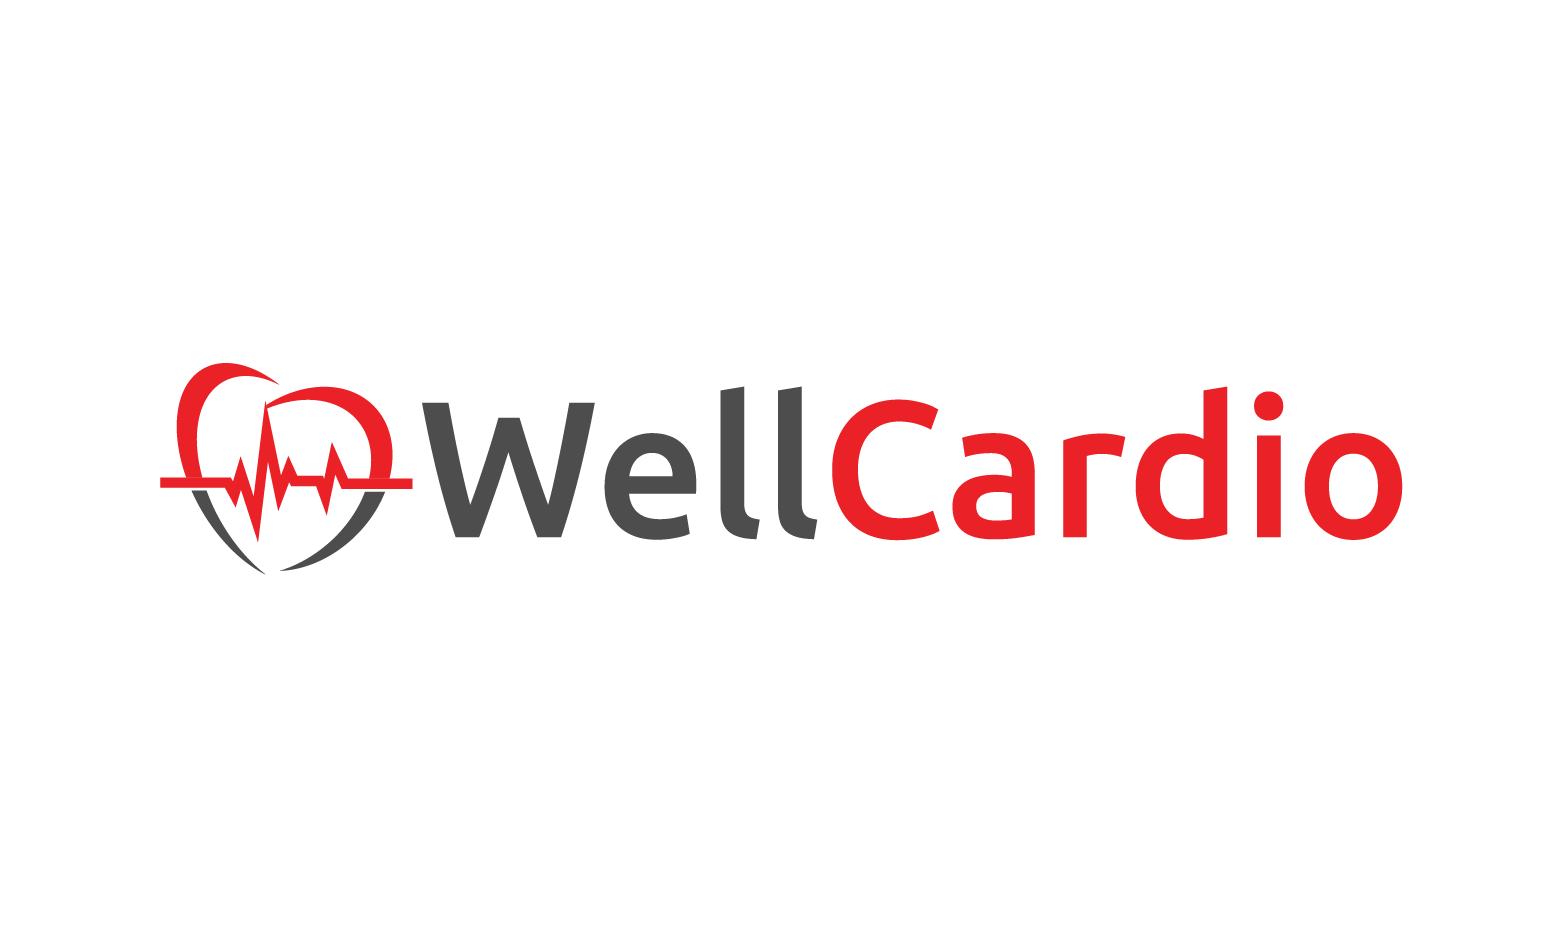 WellCardio.com